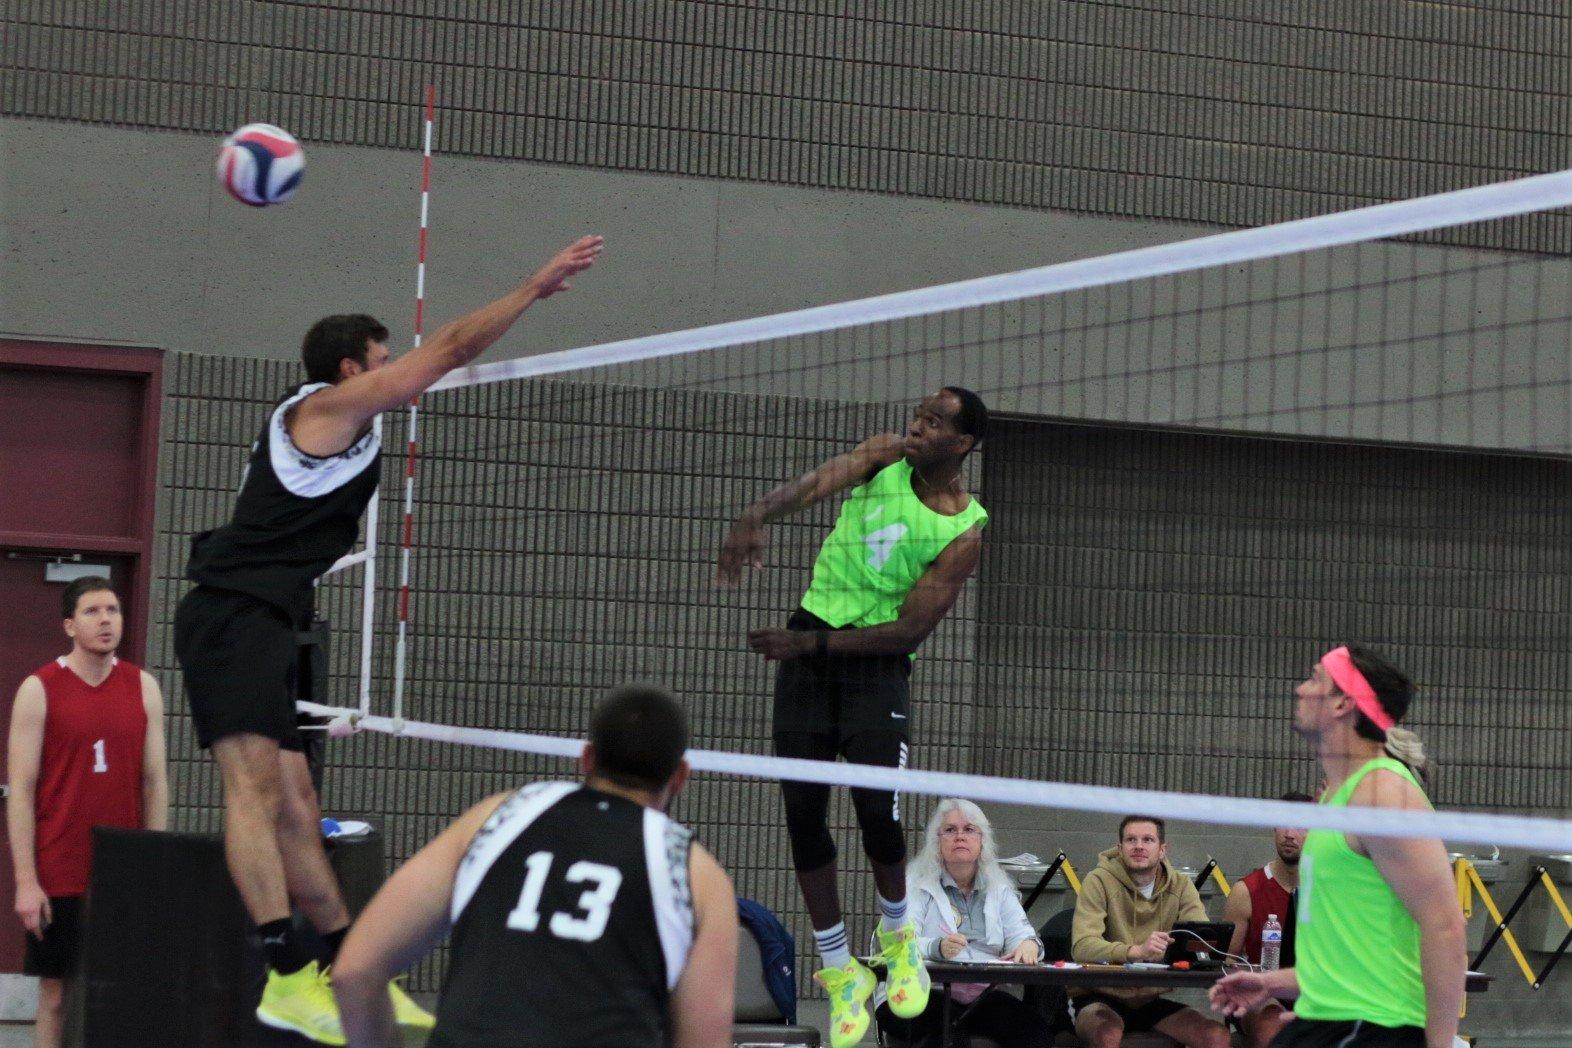 2021 USA Volleyball Open National Championship man hitting past block